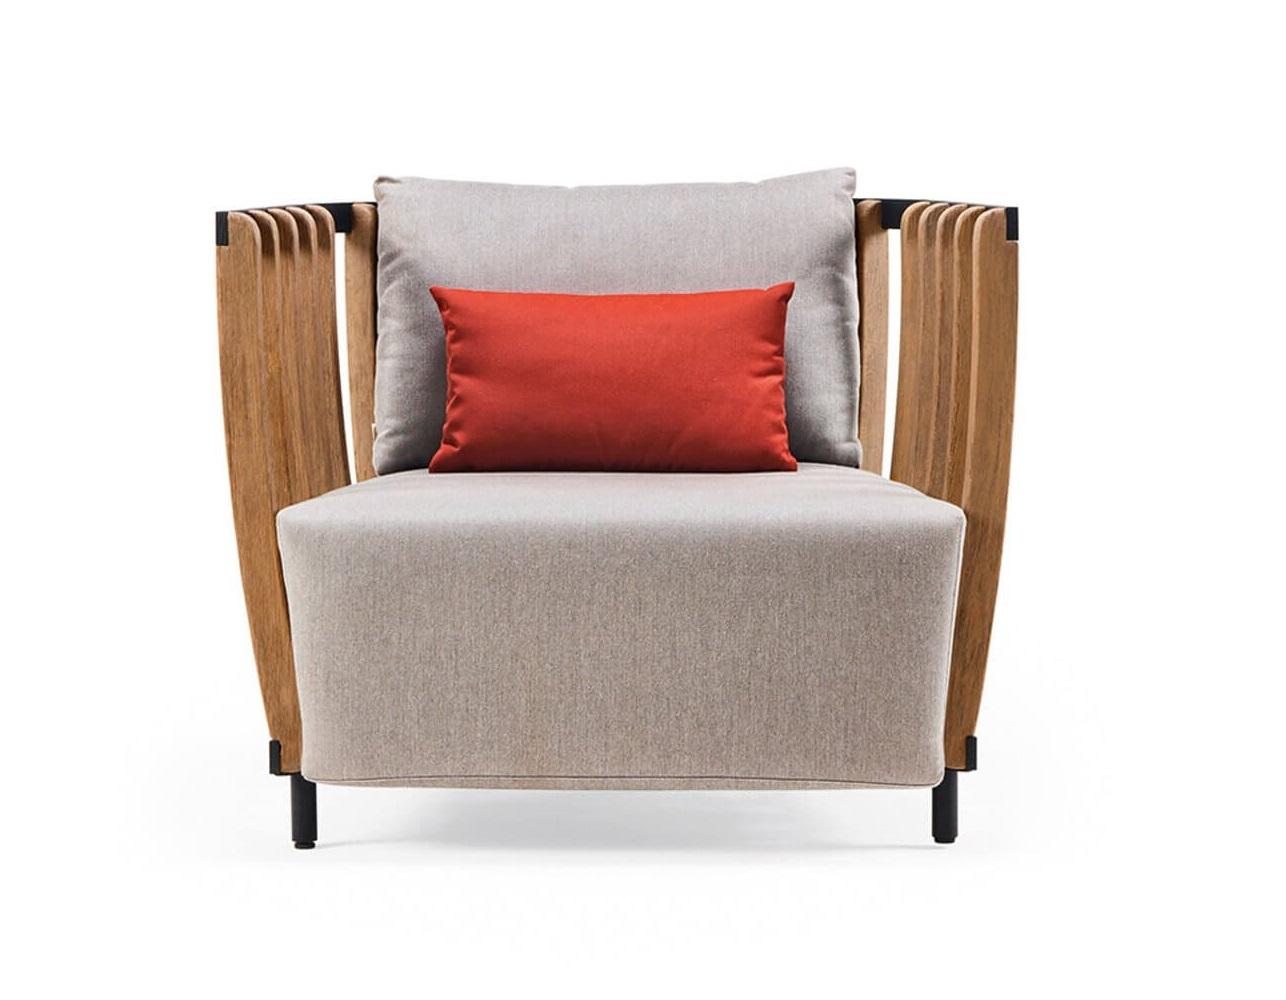 Подвесное кресло ETHIMO 15447087 от thefurnish